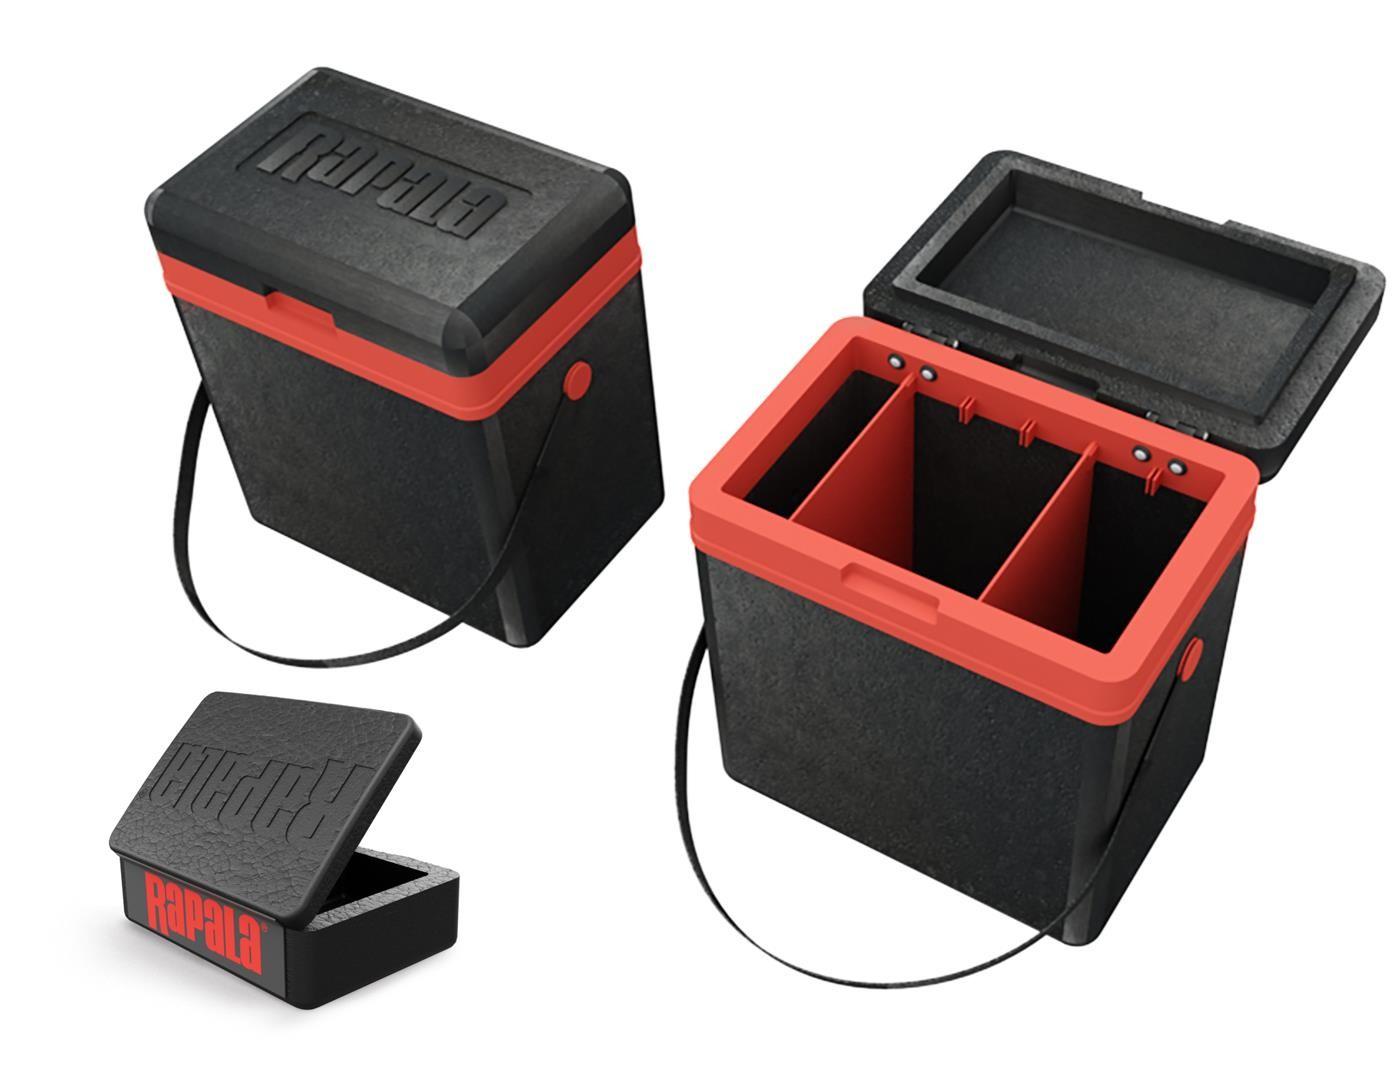 Nya Köp Rapala Ice Box Hos MIEKO TP-17